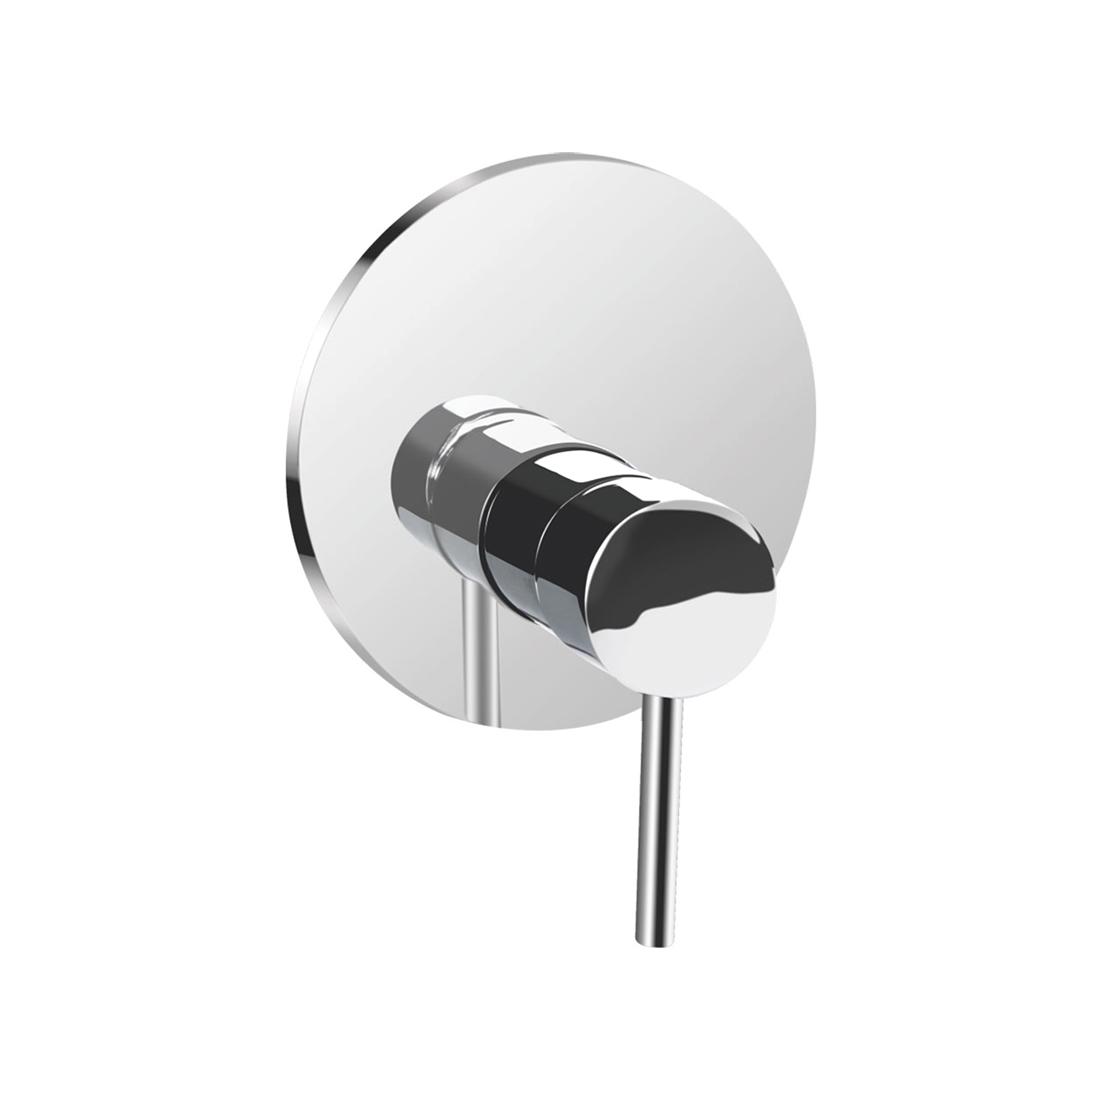 Kerovit Nucleus KB111015 Single Lever 2-Inlet Concealed Shower Mixer Trim